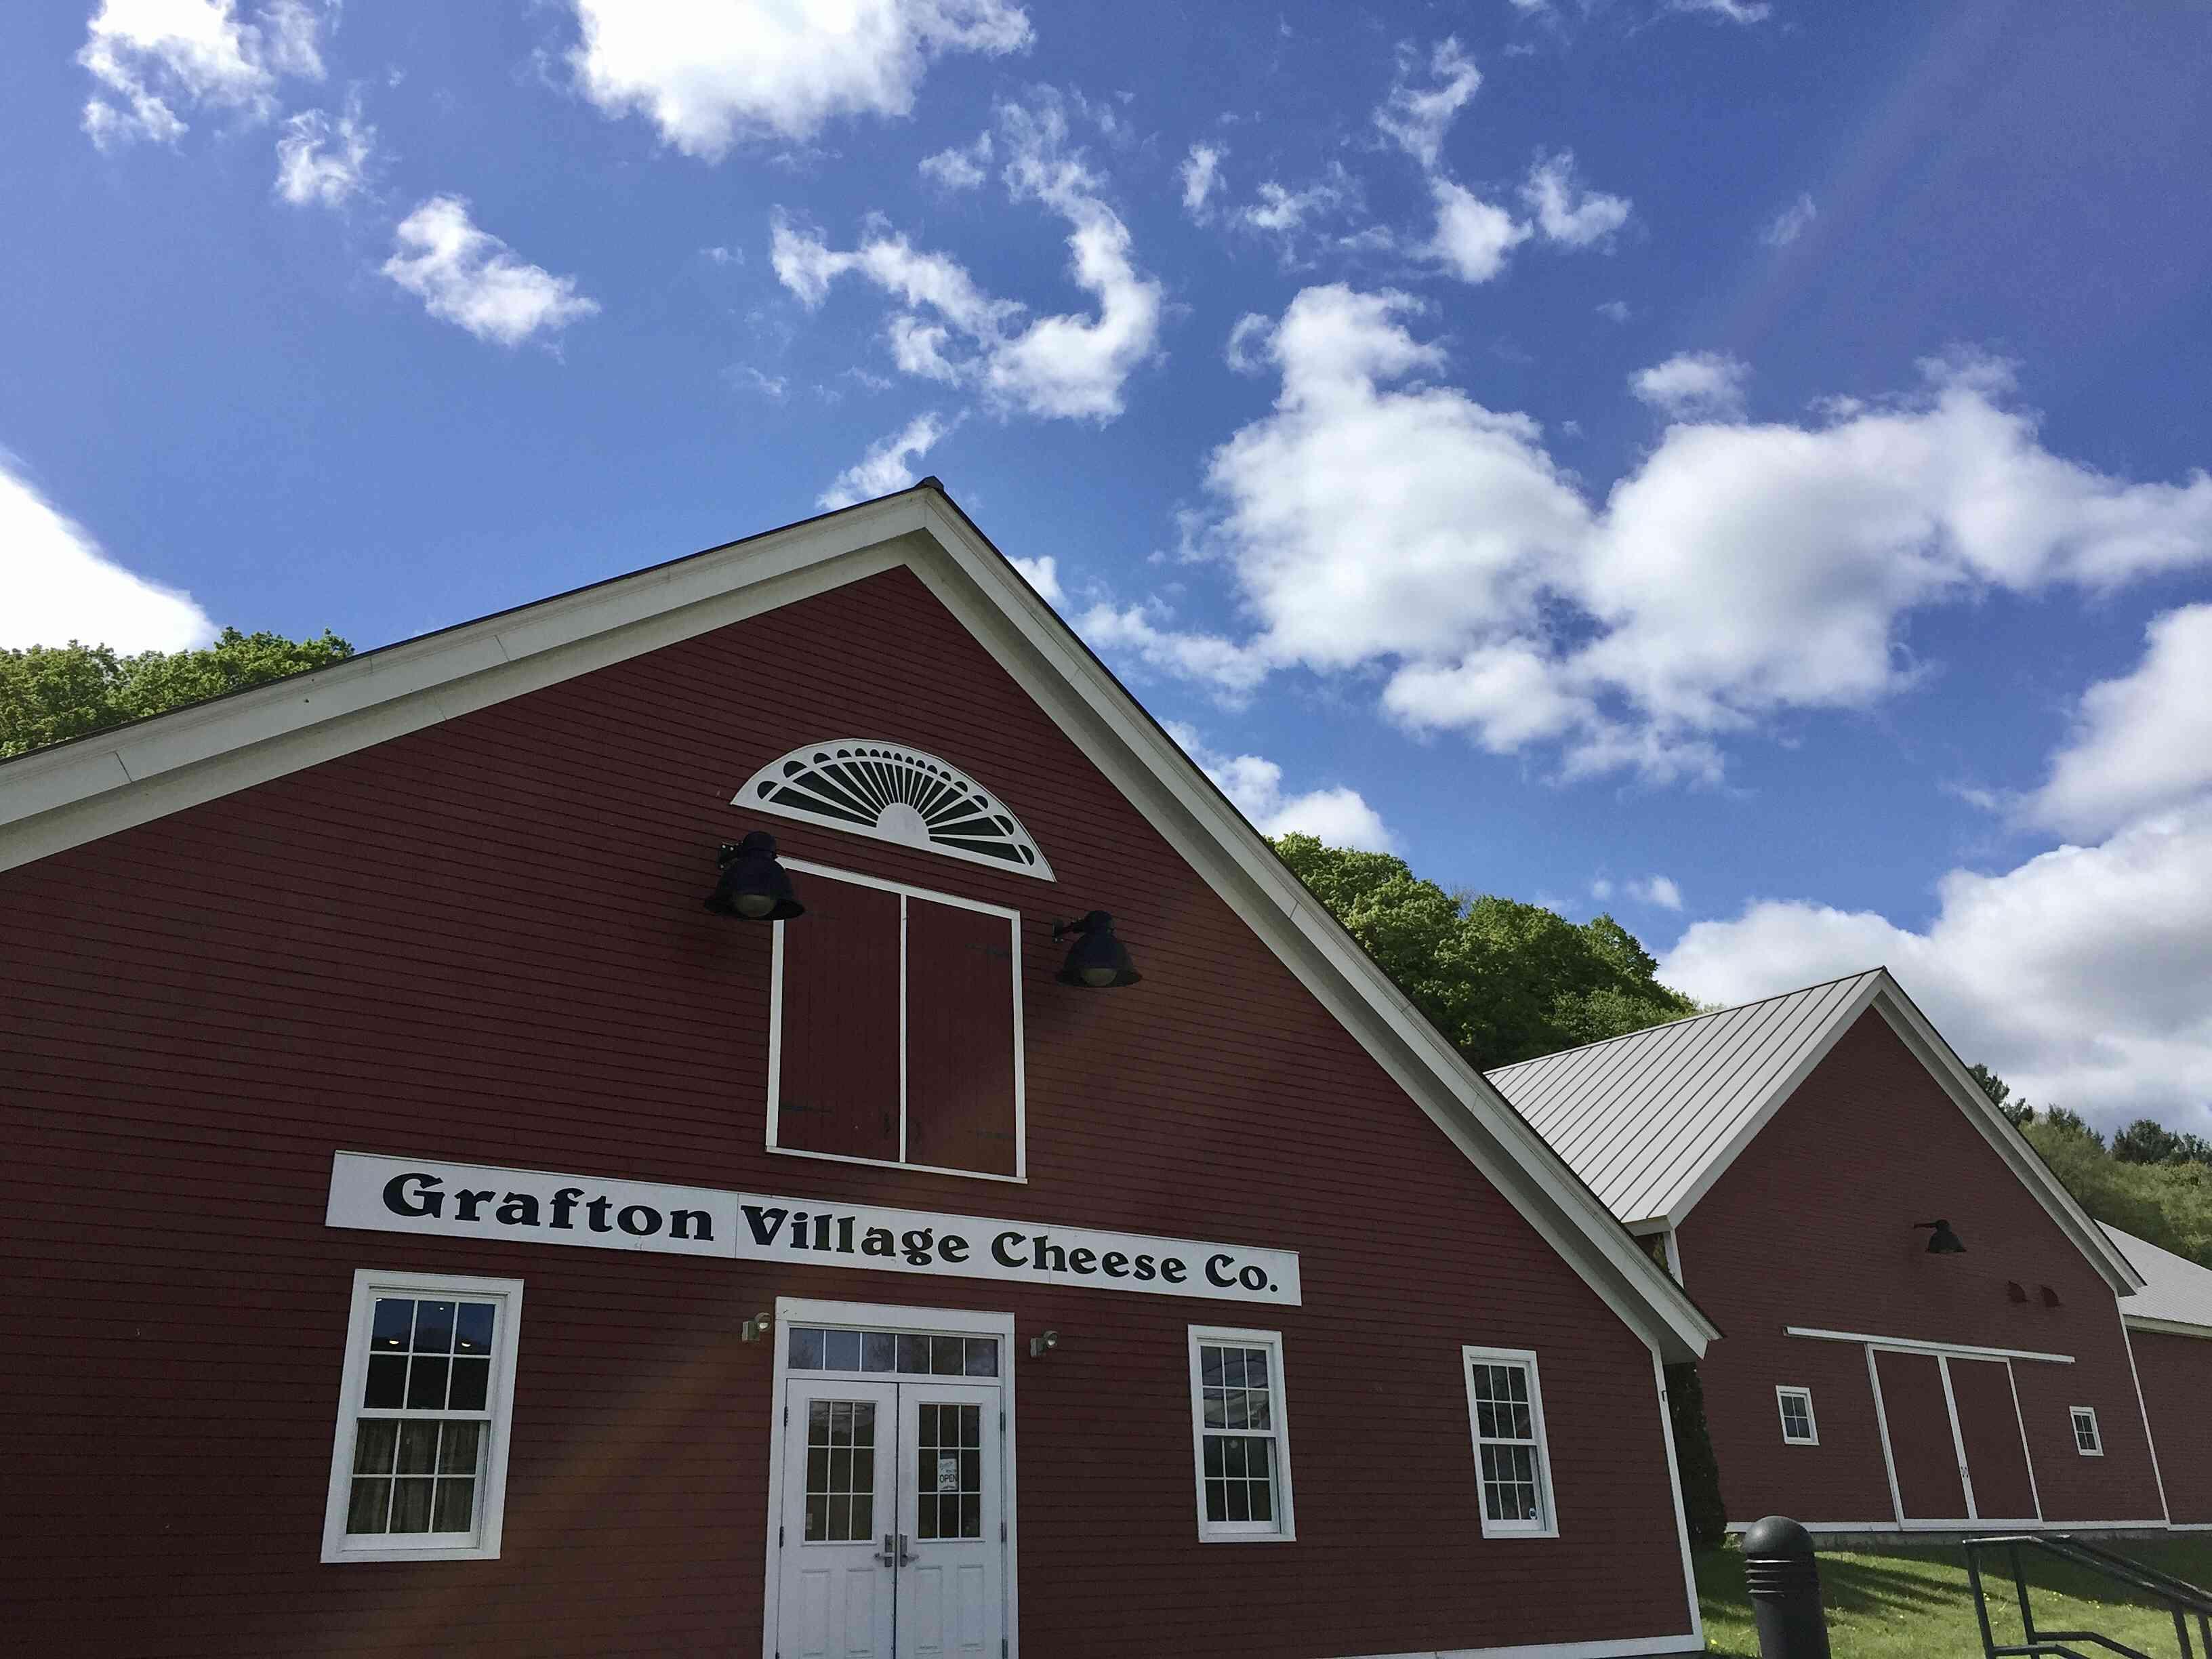 Grafton Village Cheese Co. in Grafton, Vermont